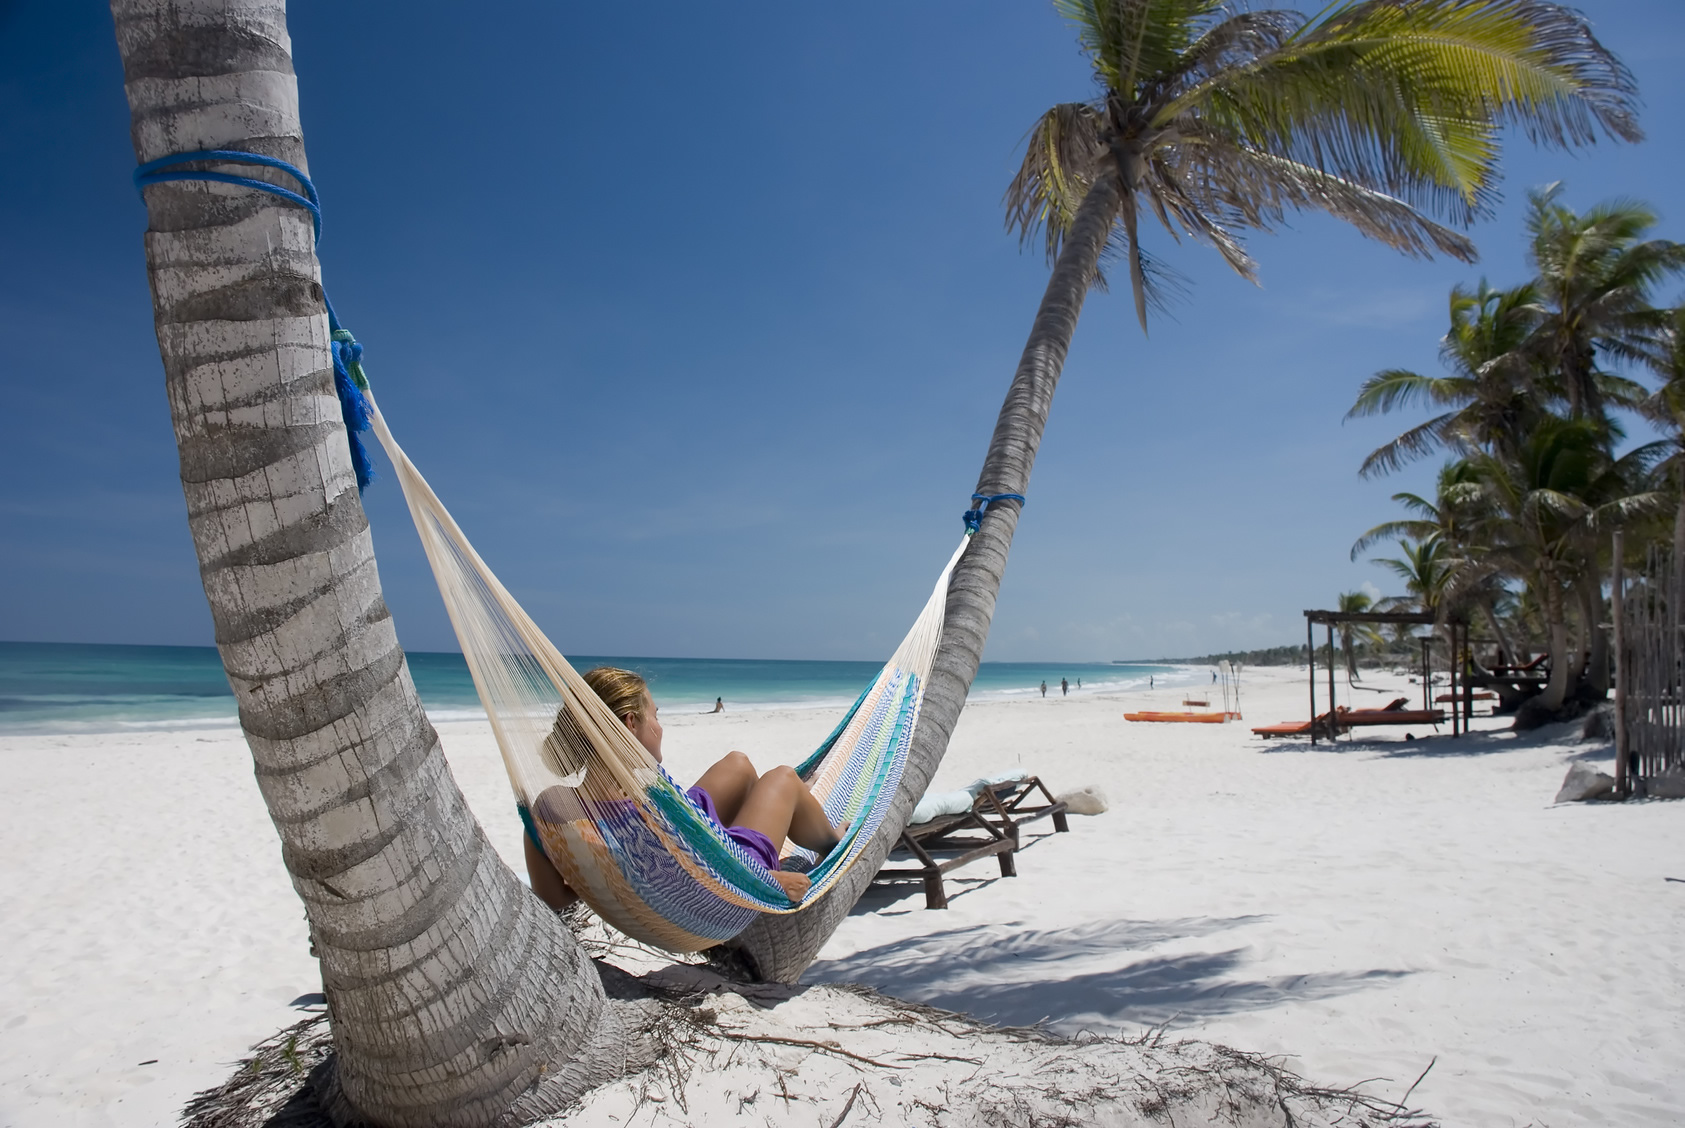 Las Mejores Actividades Turísticas En México